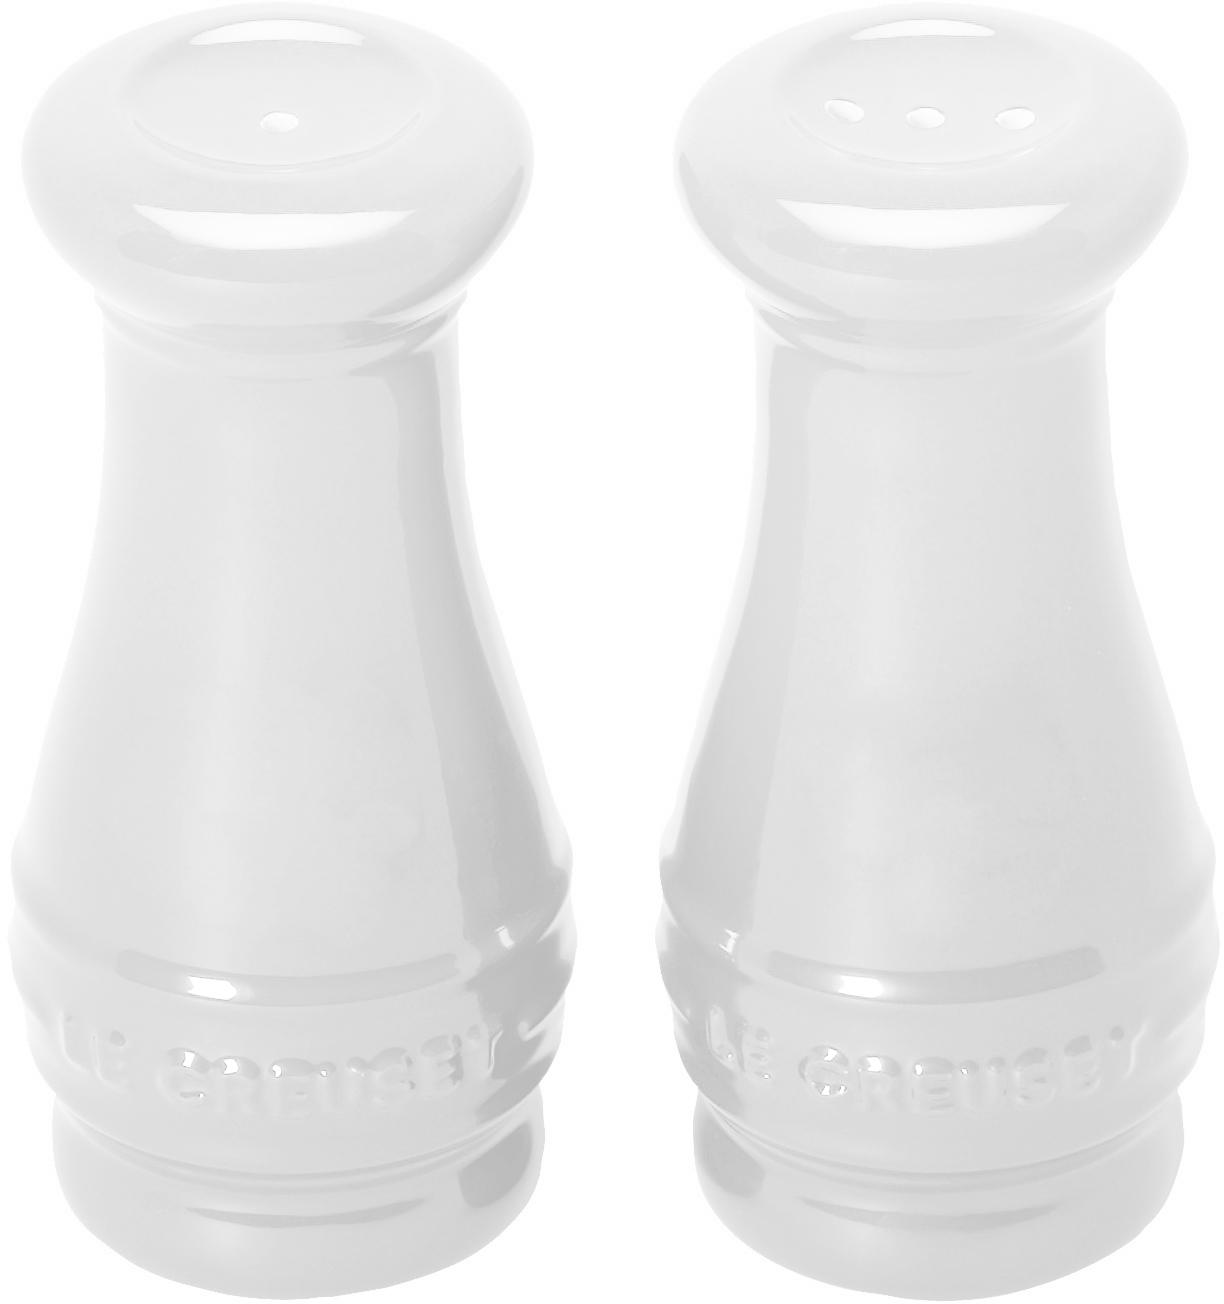 Le Creuset White Stoneware Salt and Pepper Shaker Set